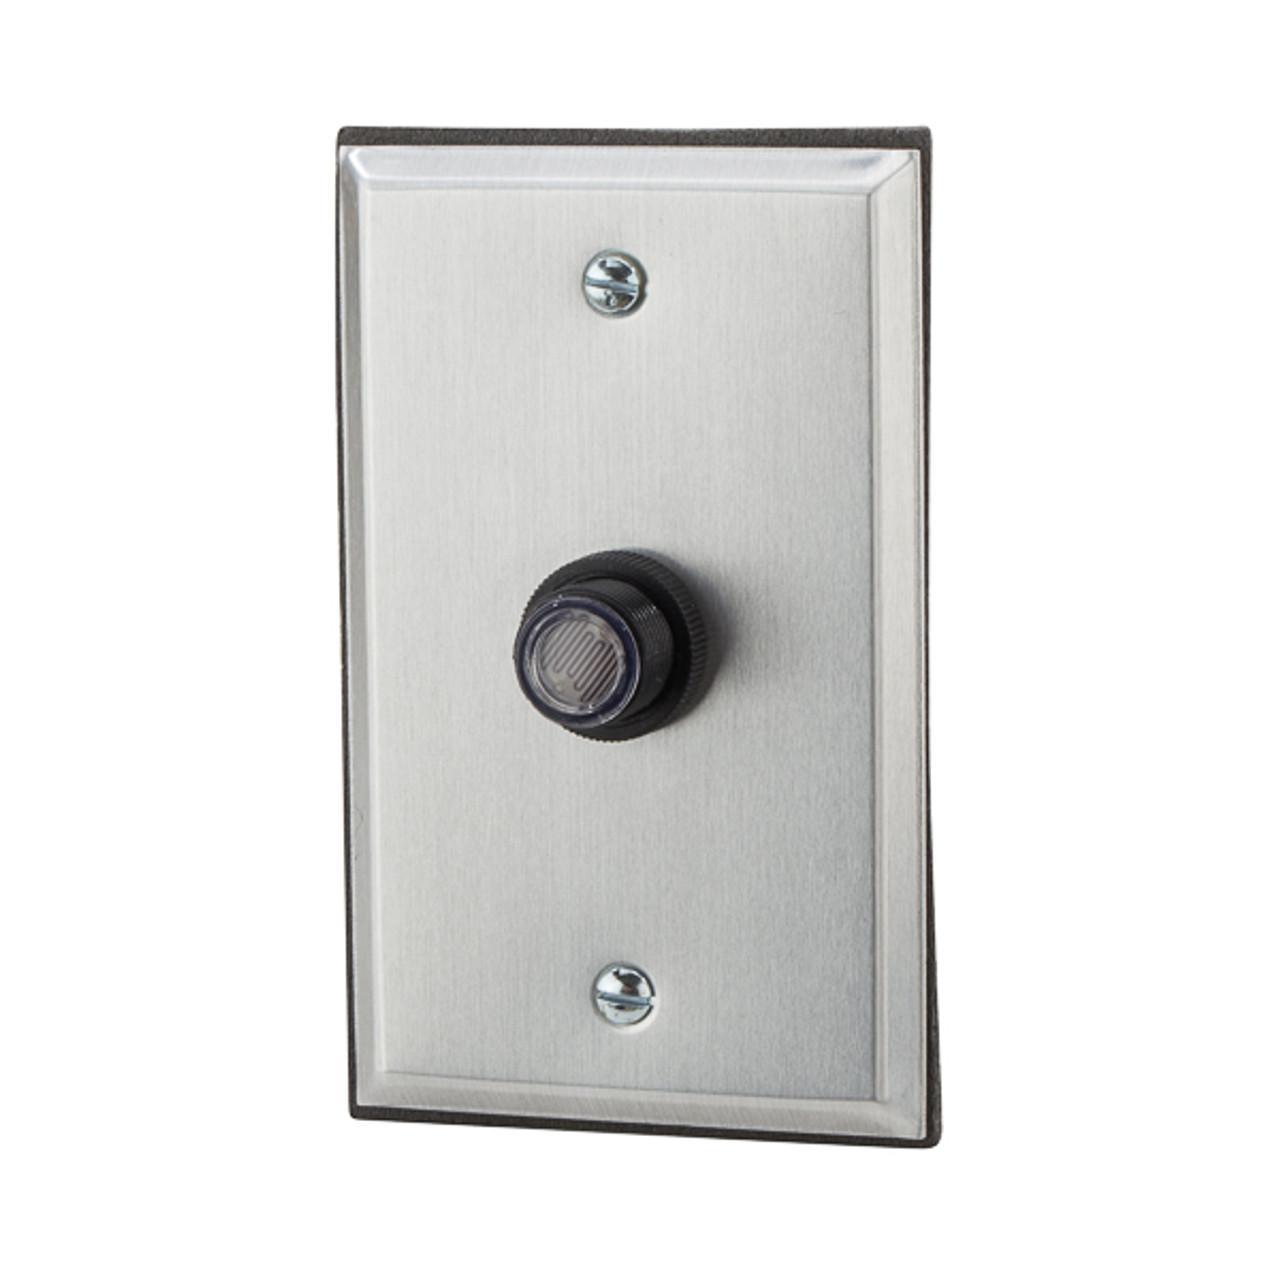 Tork 3010 120v 2000w Flush Mounted Photo Control